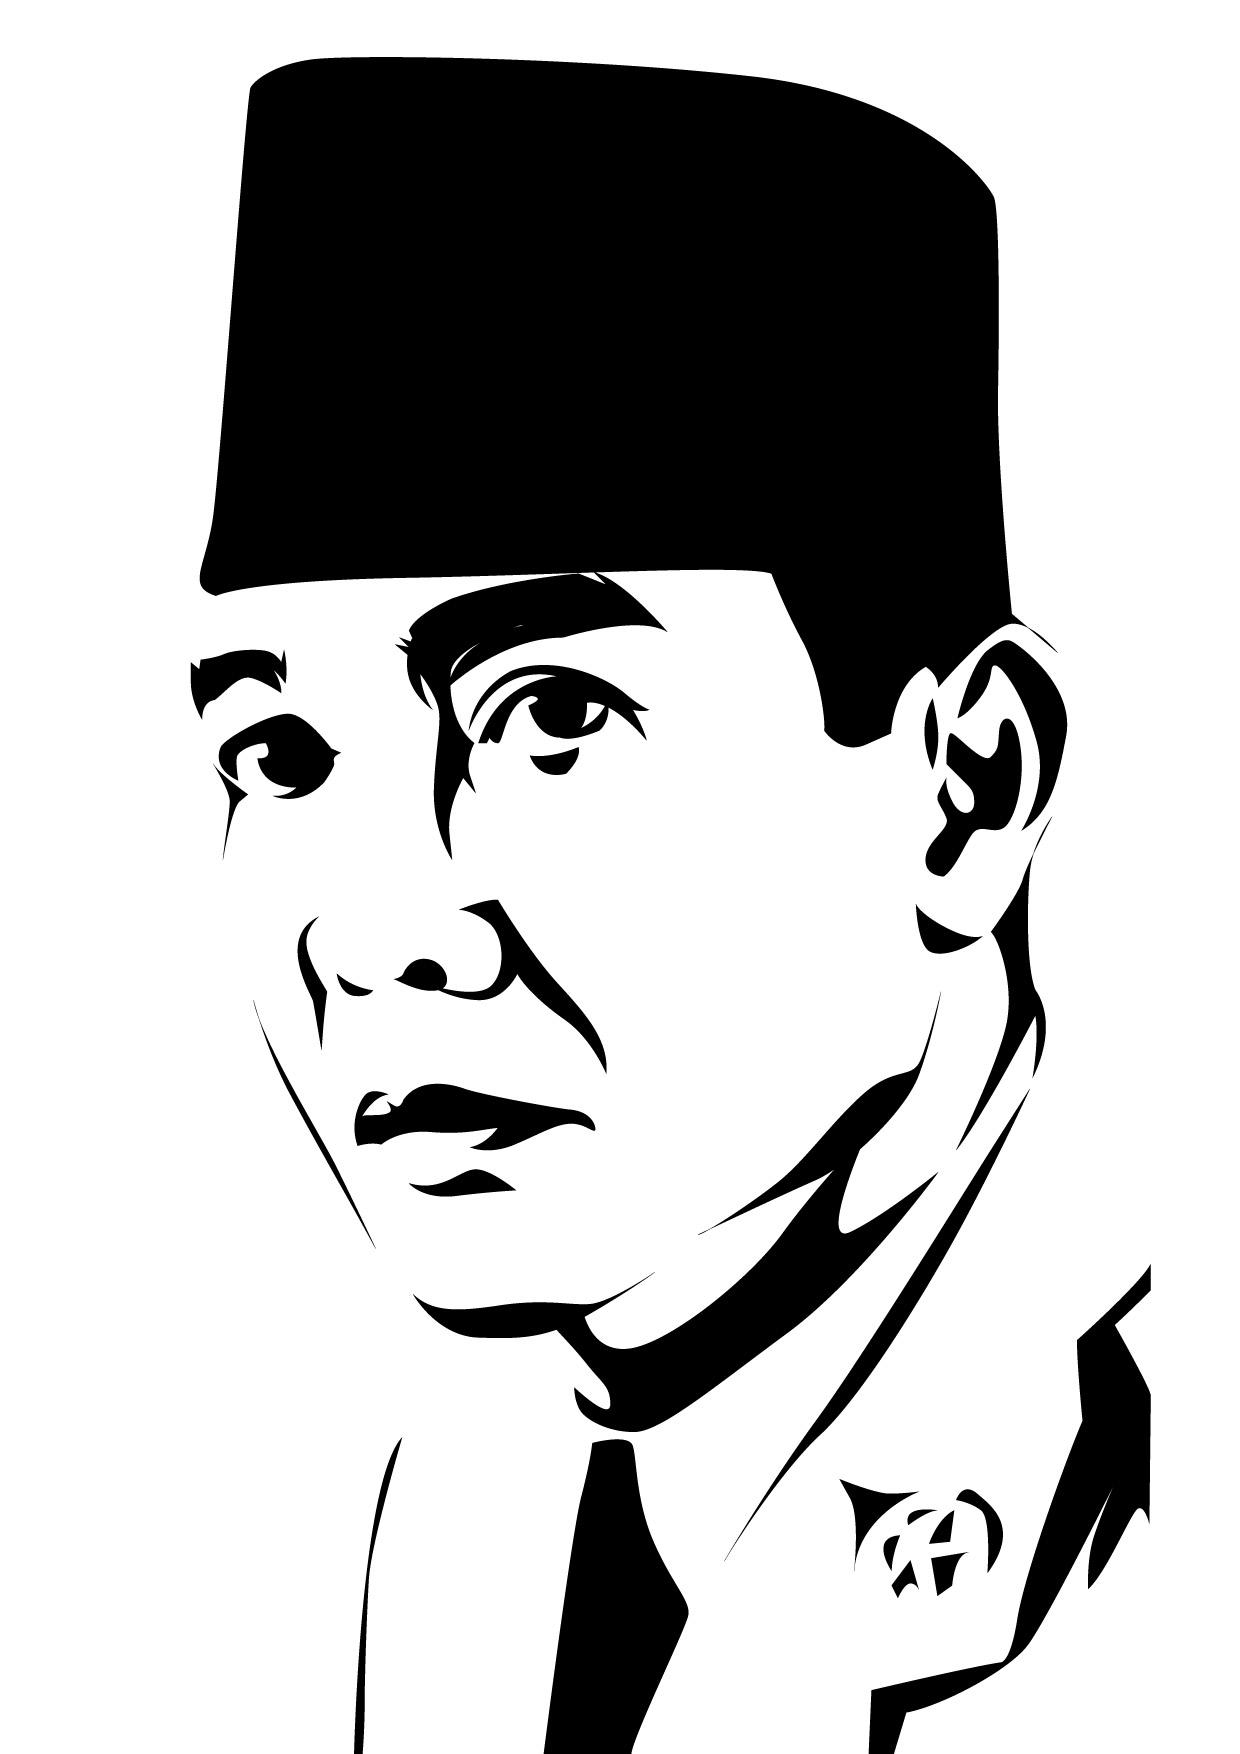 Bung Karno By Astayoga On DeviantArt